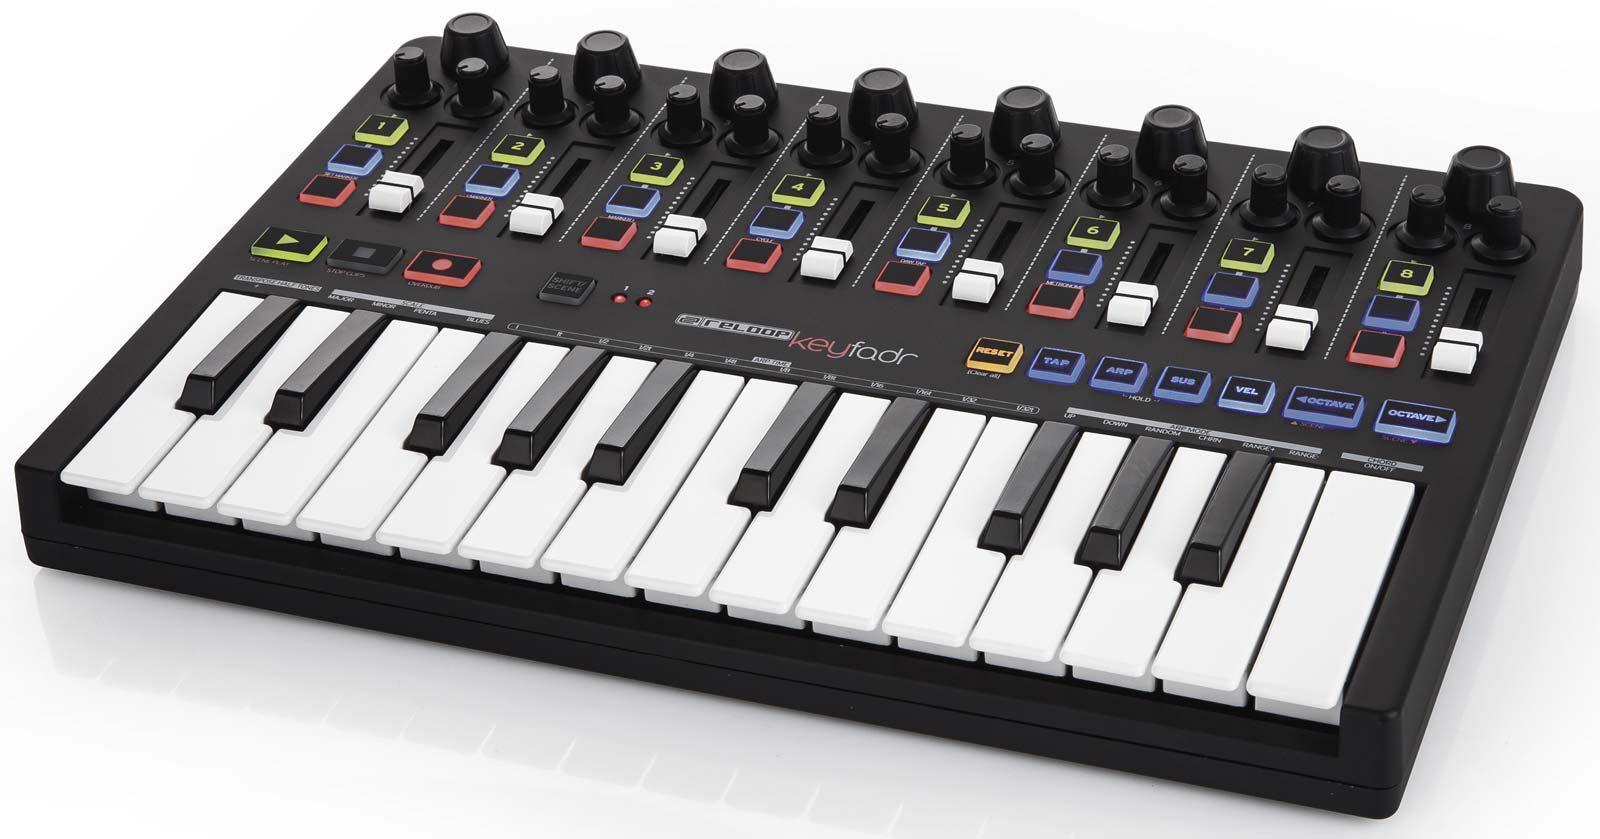 reloop keyfadr compact usb midi keyboard with daw control agiprodj. Black Bedroom Furniture Sets. Home Design Ideas